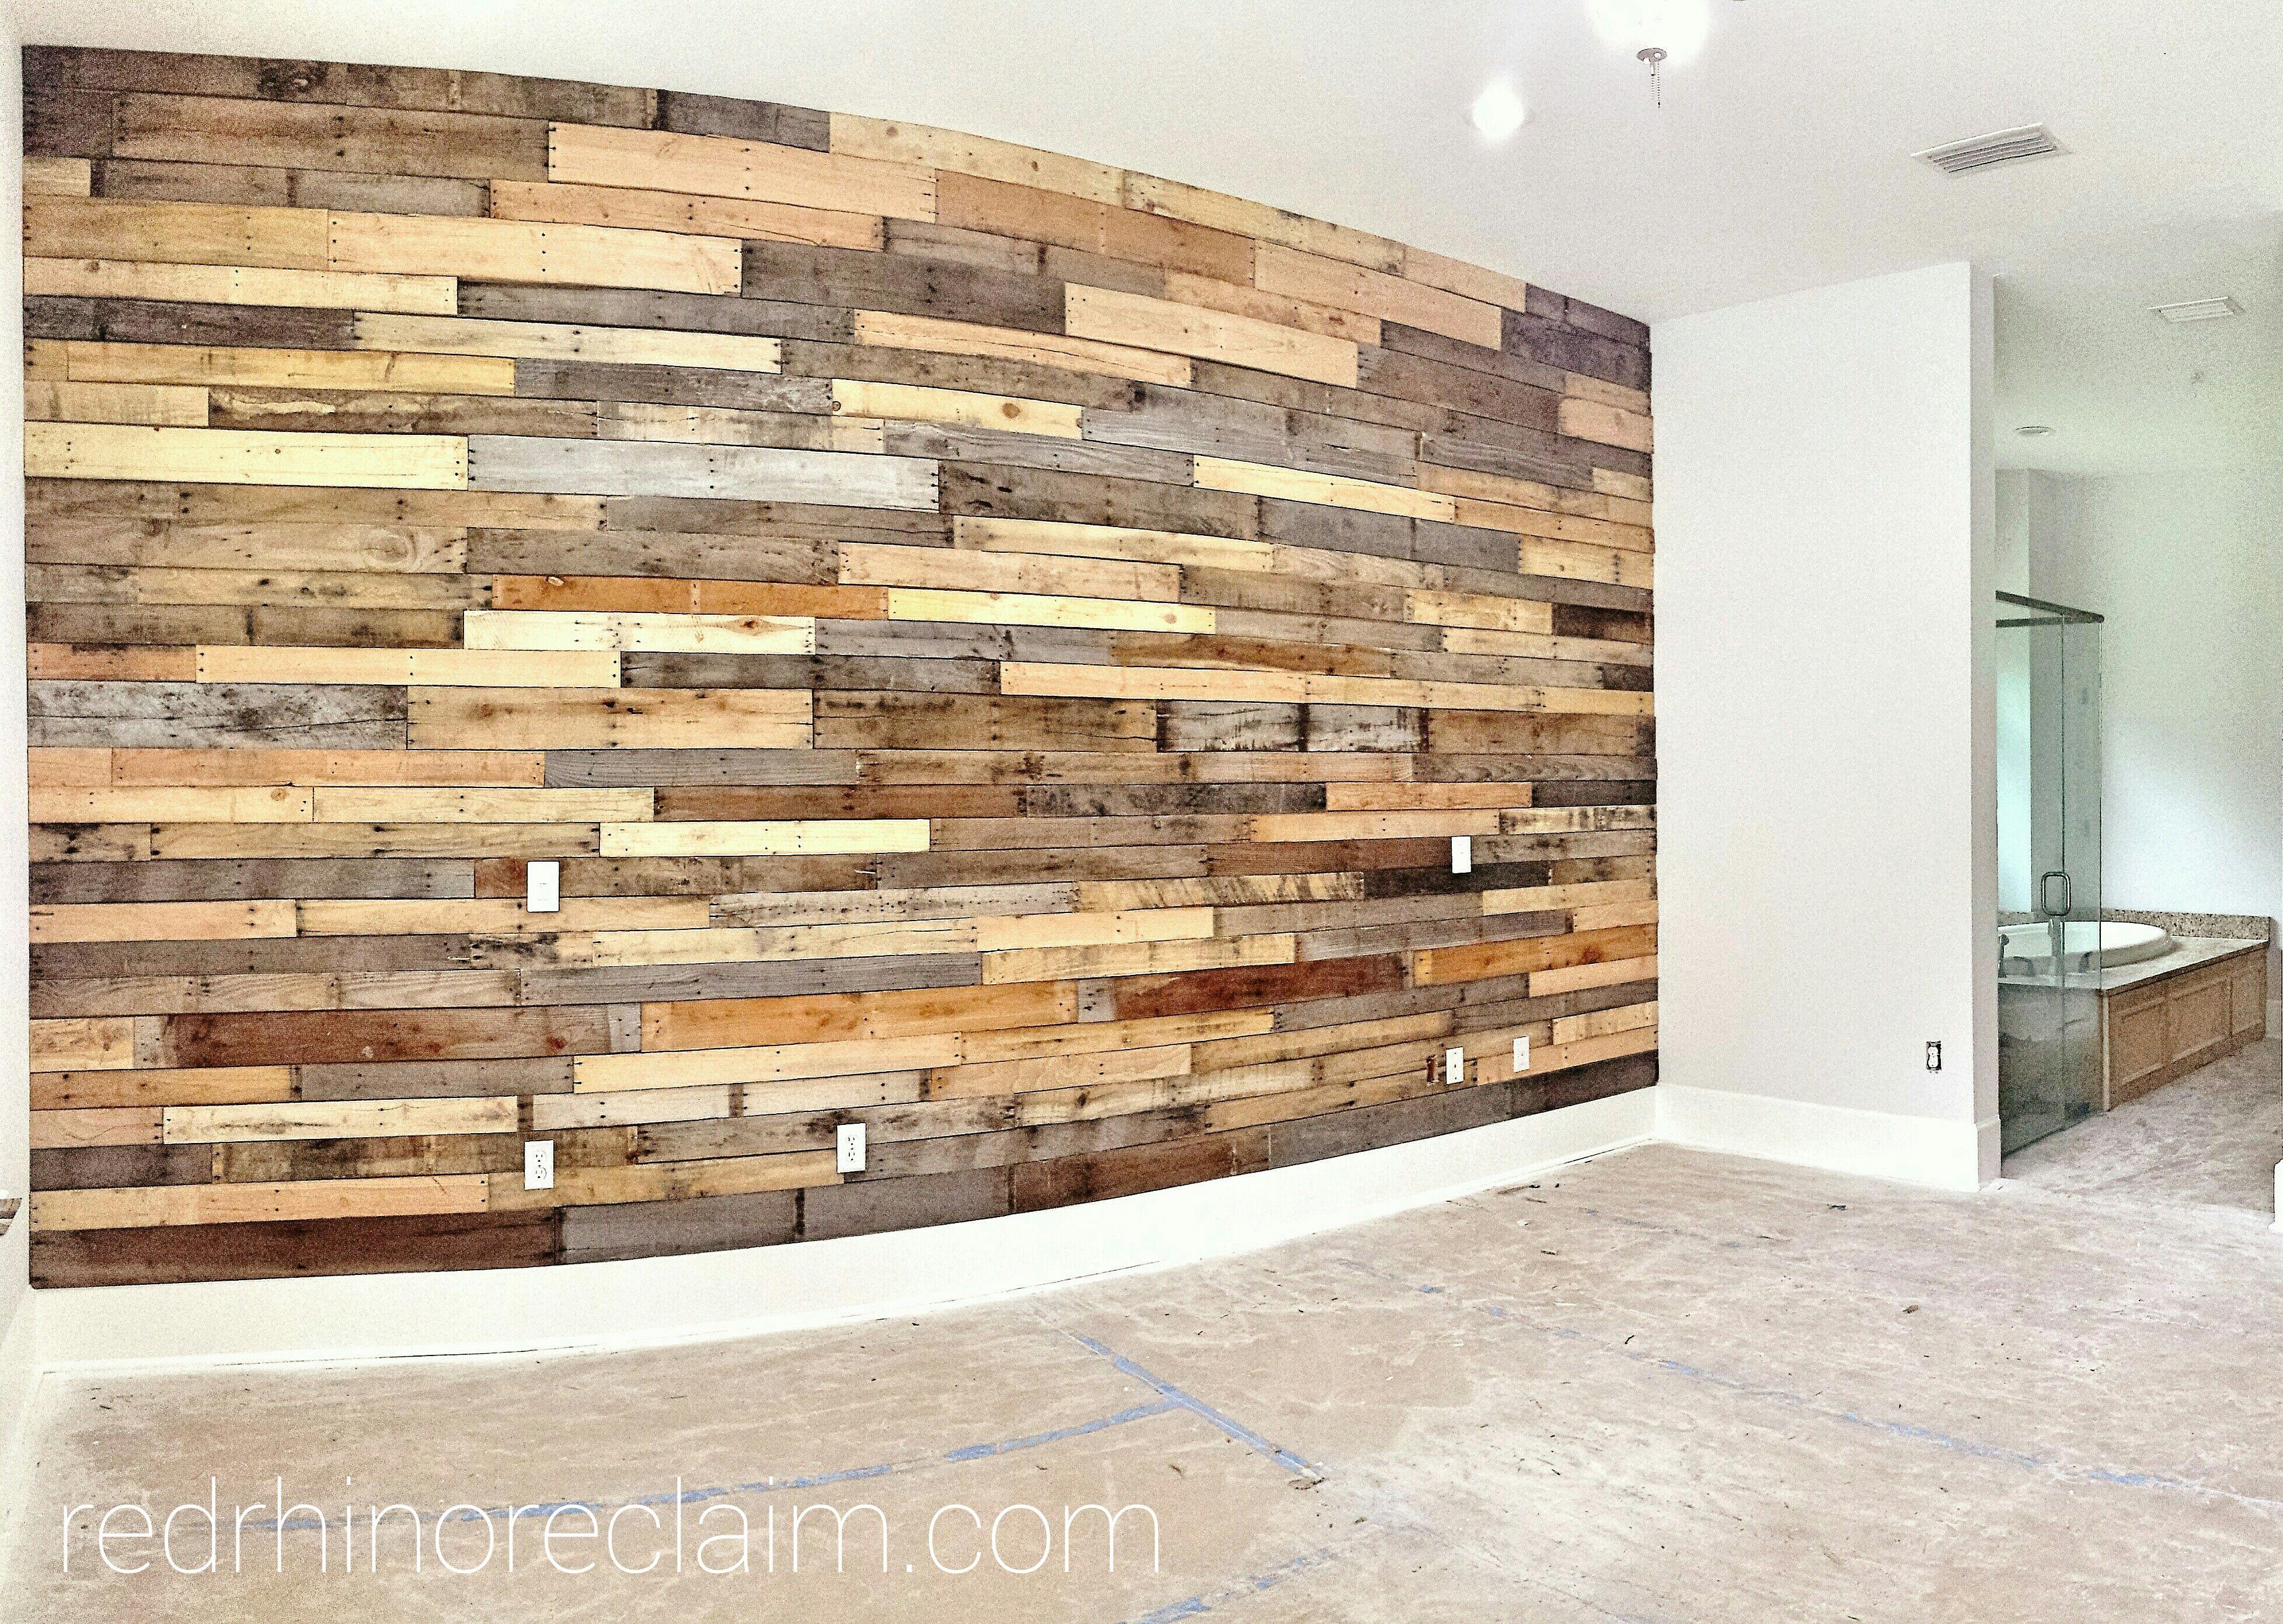 Natural Finish Red Rhino Reclaim Wall Installation In Gainesville Fl Www Redrhinoreclaim Com